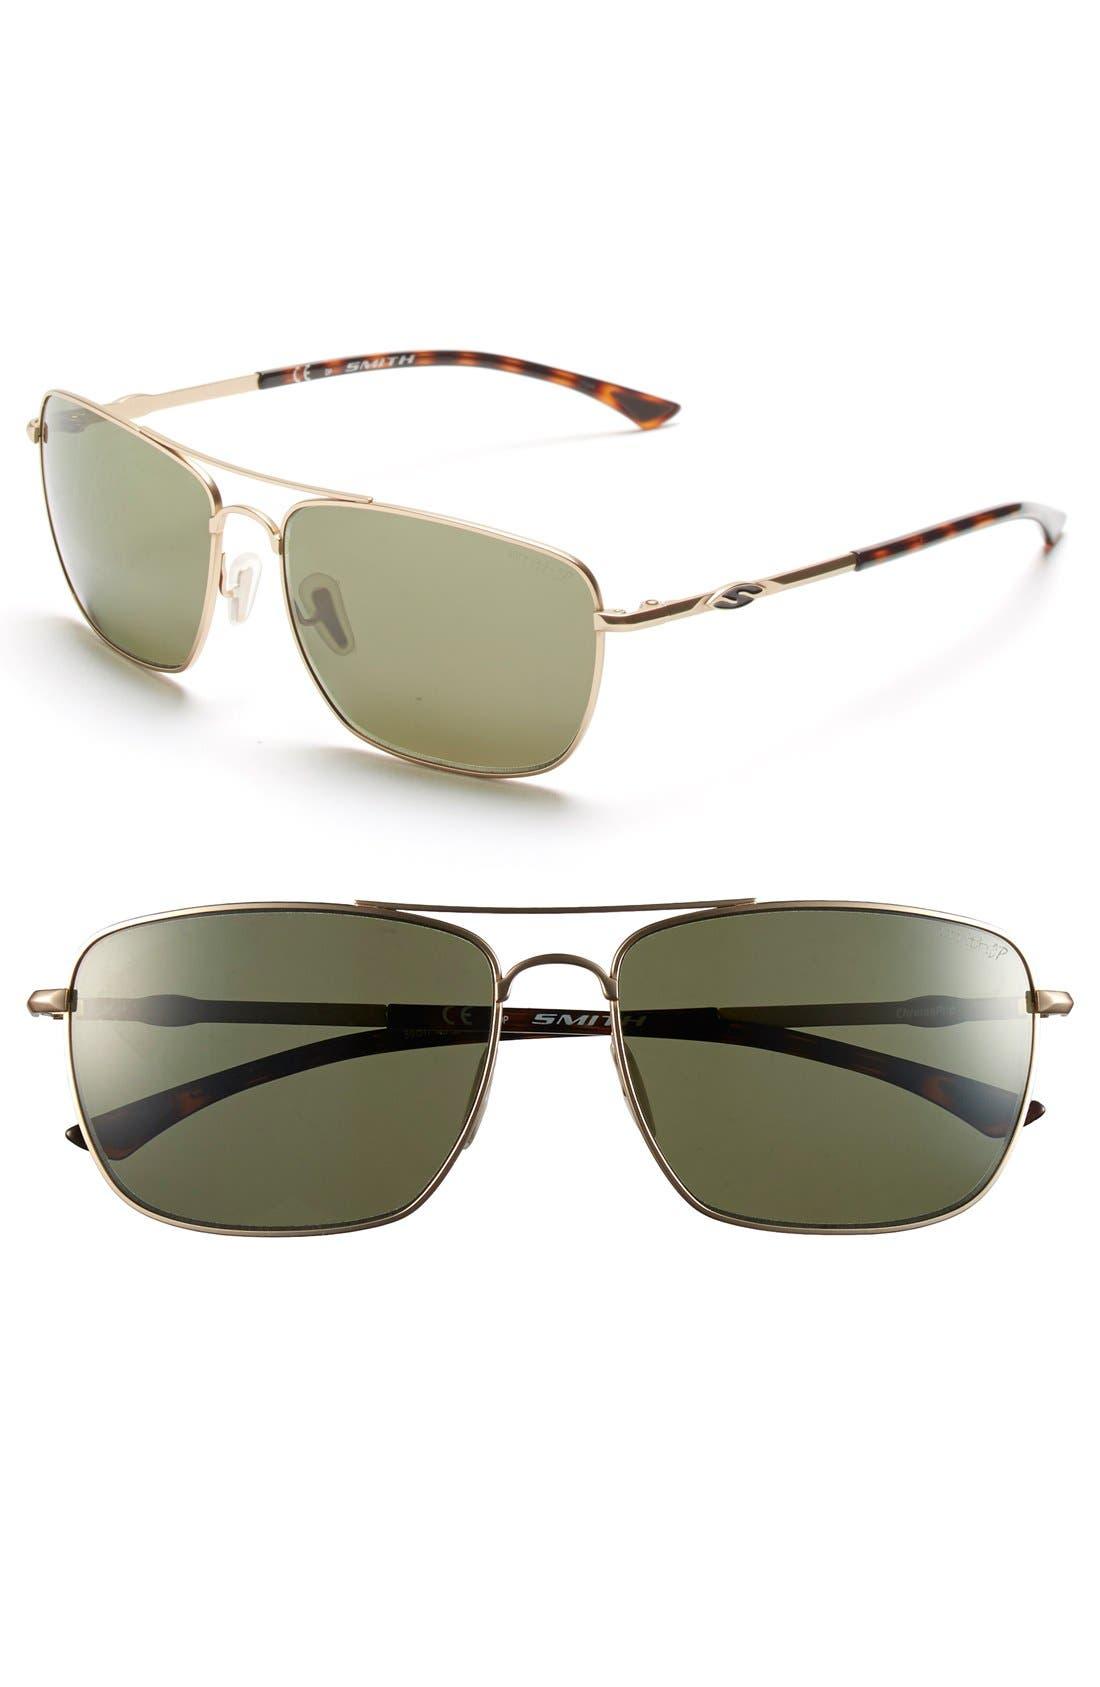 SMITH,                             'Nomad' 59mm Polarized Sunglasses,                             Main thumbnail 1, color,                             710